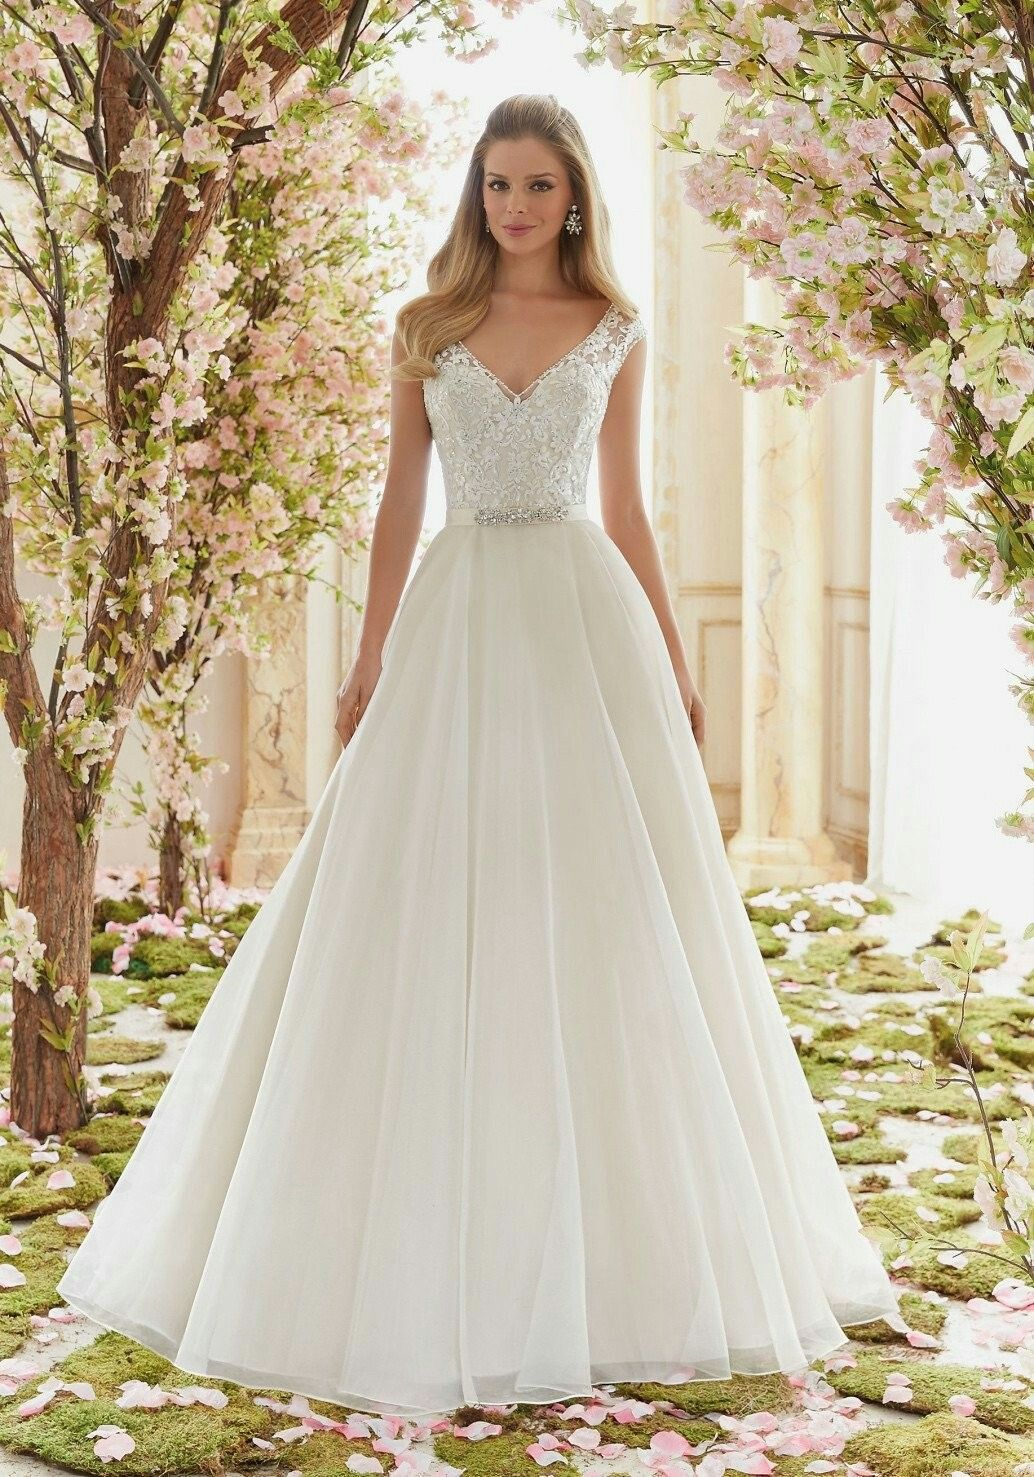 Pin by Şeker portakalı on elbiseler pinterest wedding dress